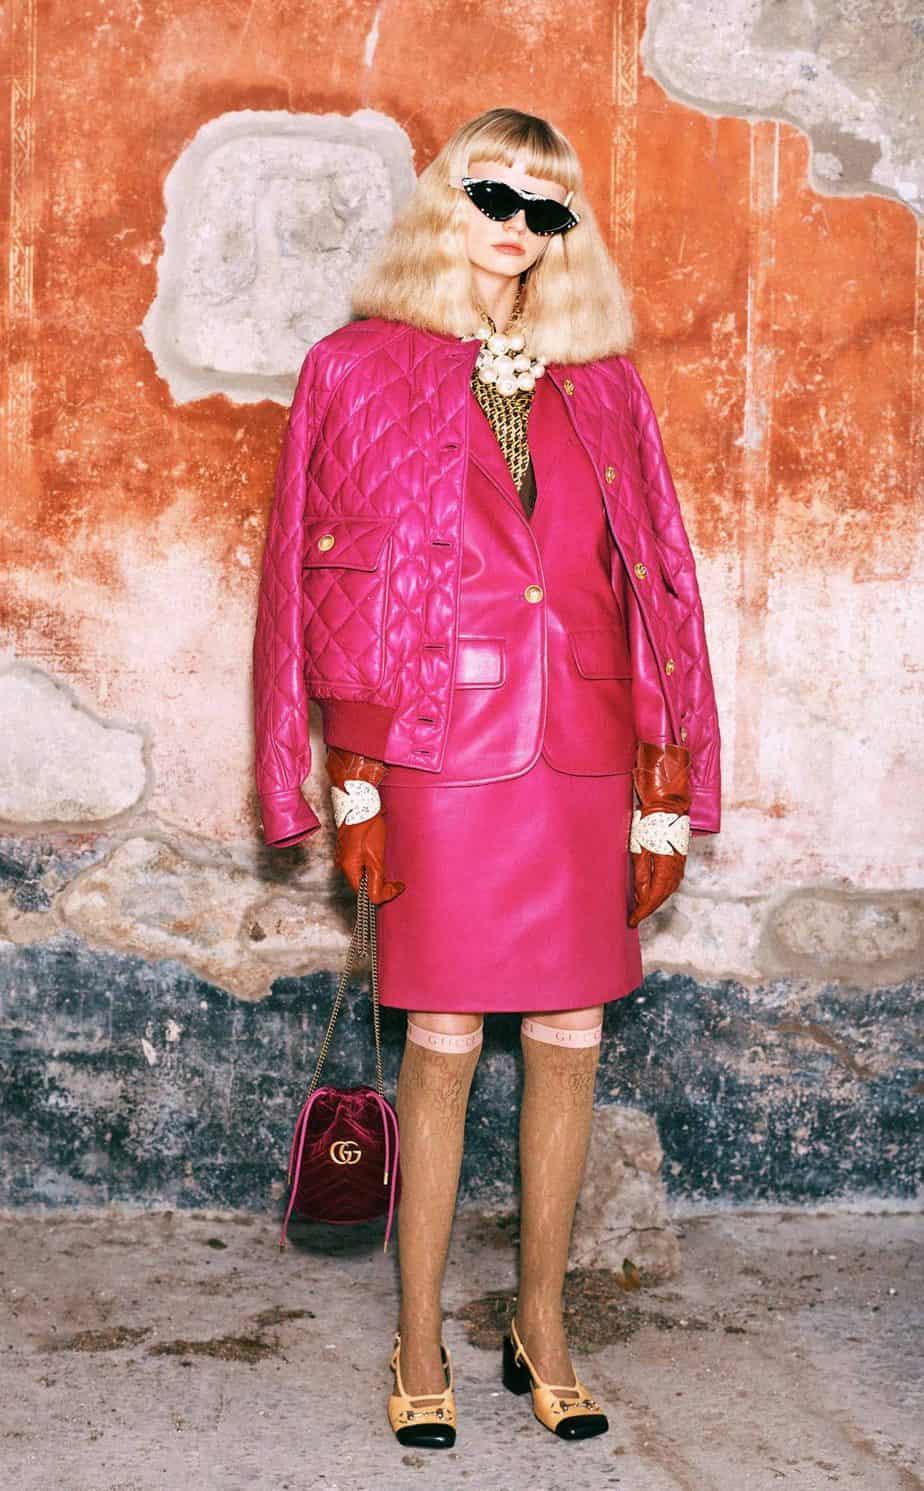 GUCCI, FALL 2019. WOMEN'S FASHION, Photographer Harmony Korine, Art Director, Christopher Simmonds - 30